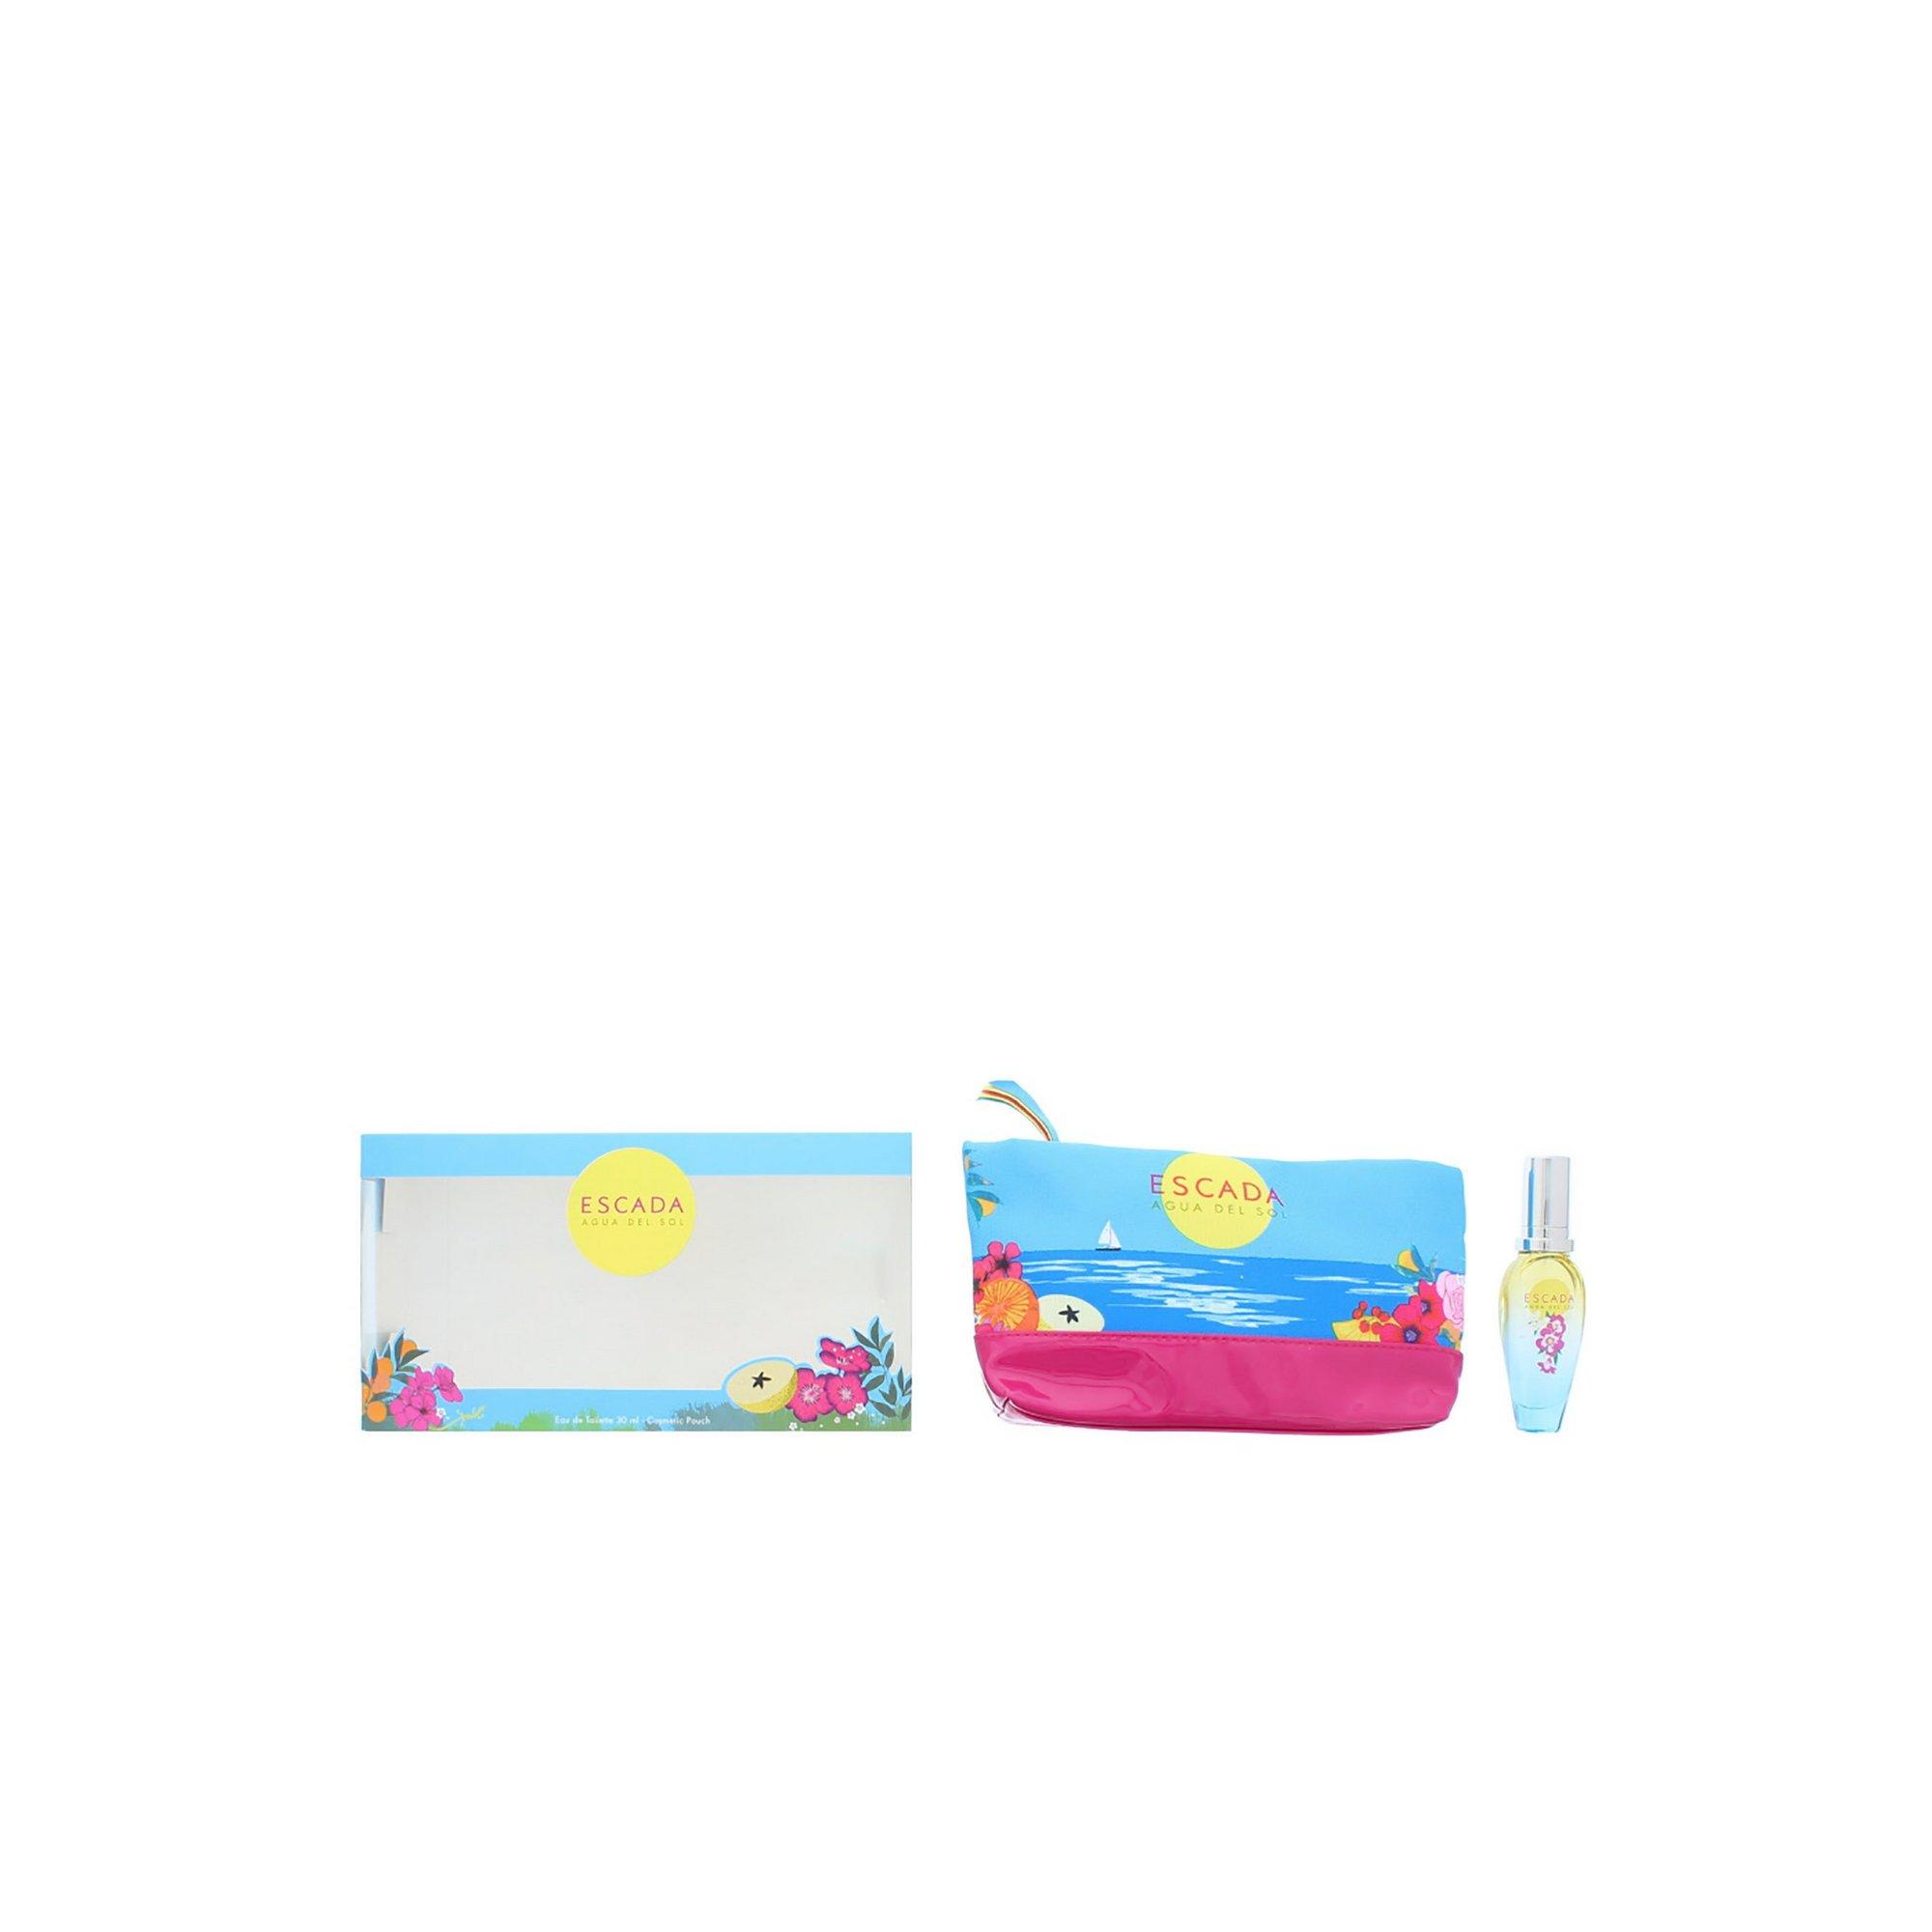 Image of Escada Agua Del Sol 30ml Eau De Toilette Gift Set